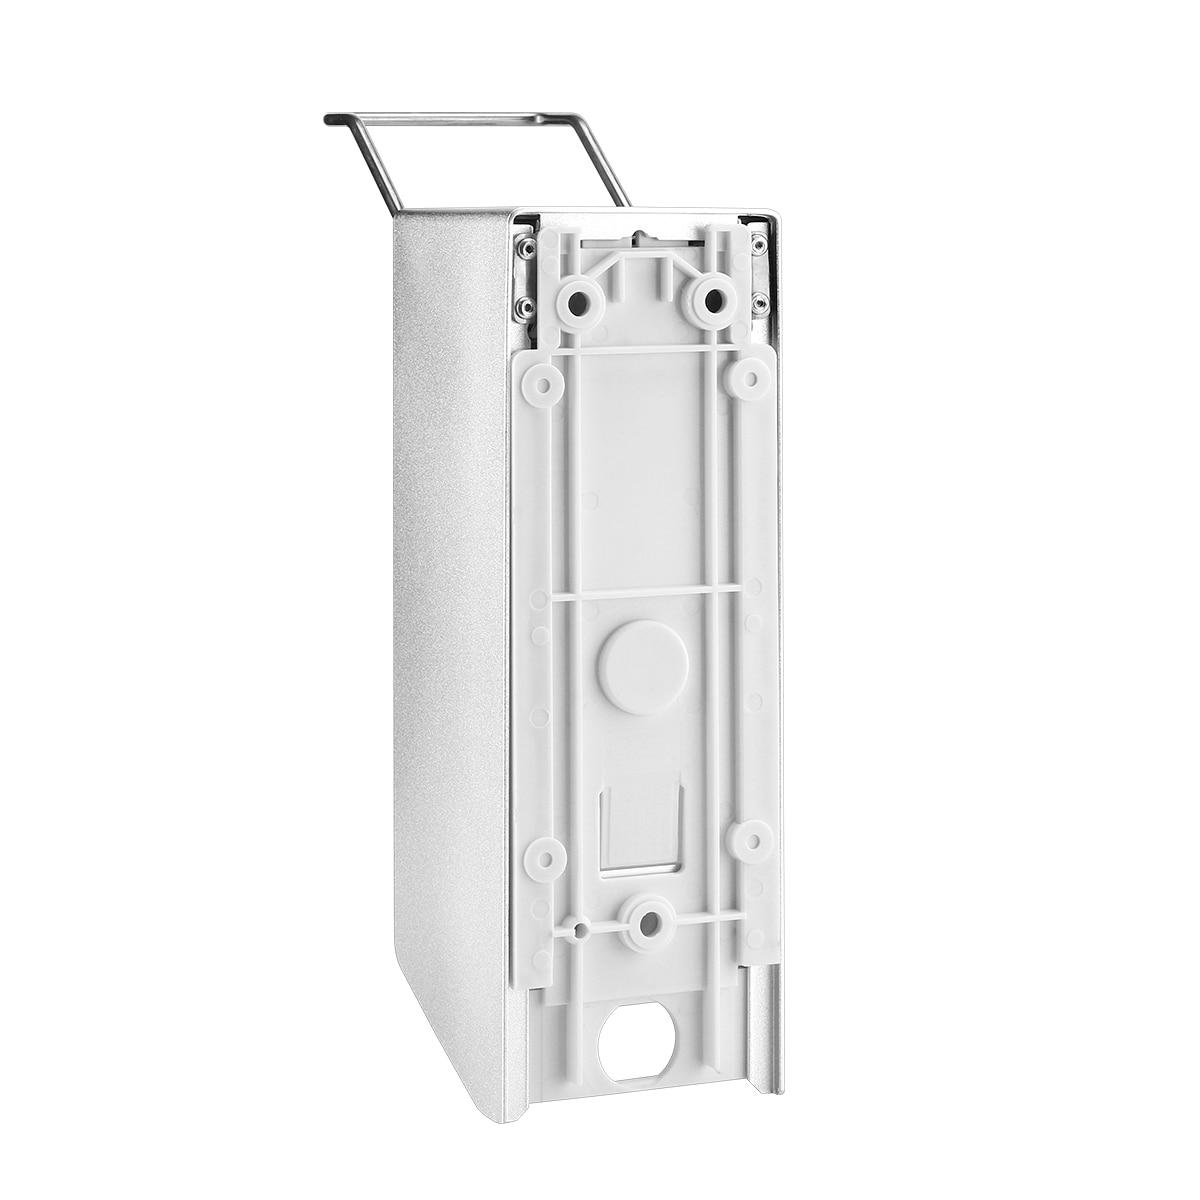 H5ef3c034191e4fd995869d6149910087W Wall-Mount Liquid Soap Dispenser Pump Hospital Elbow Press Hand Sanitizer Soap Dispenser Bottle For Kitchen Hotel Bathroom